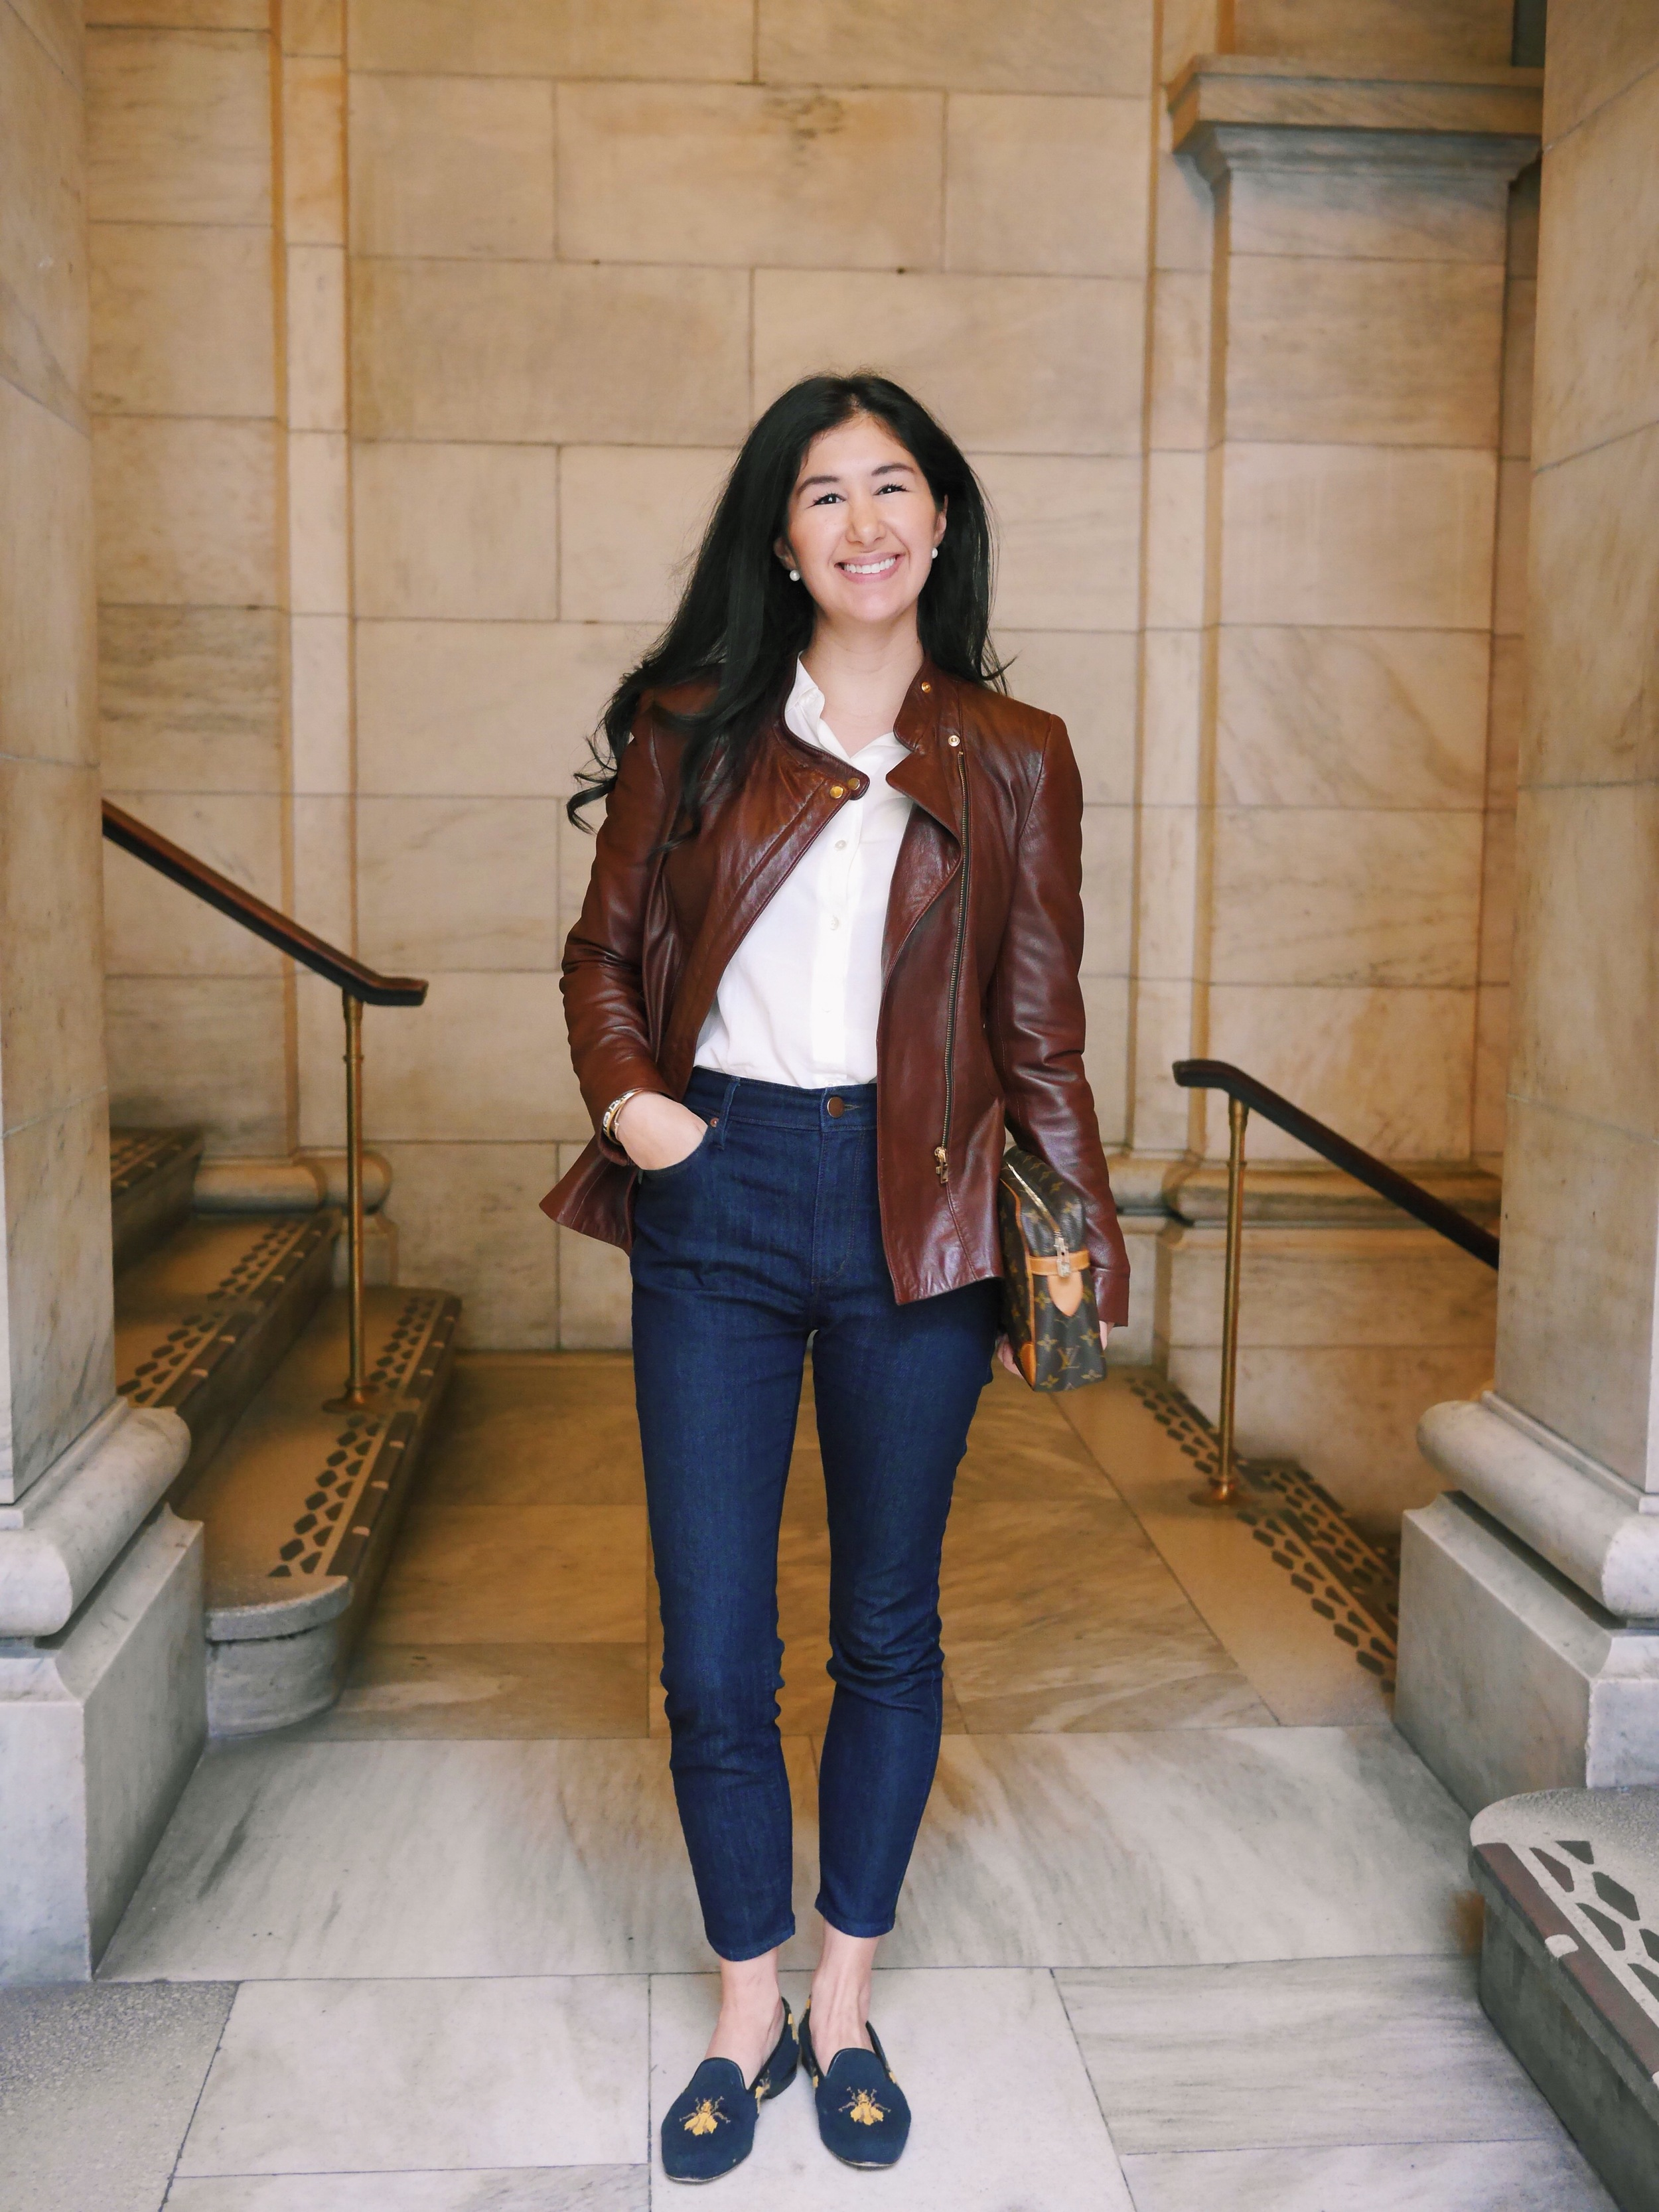 2 Zara Leather Jacket LOFT Skinny Jeans Everlane Silk Shirt Stubbs and Wootton Shoes Hermes Bracelet J Crew Cashmere Cardigan.JPG